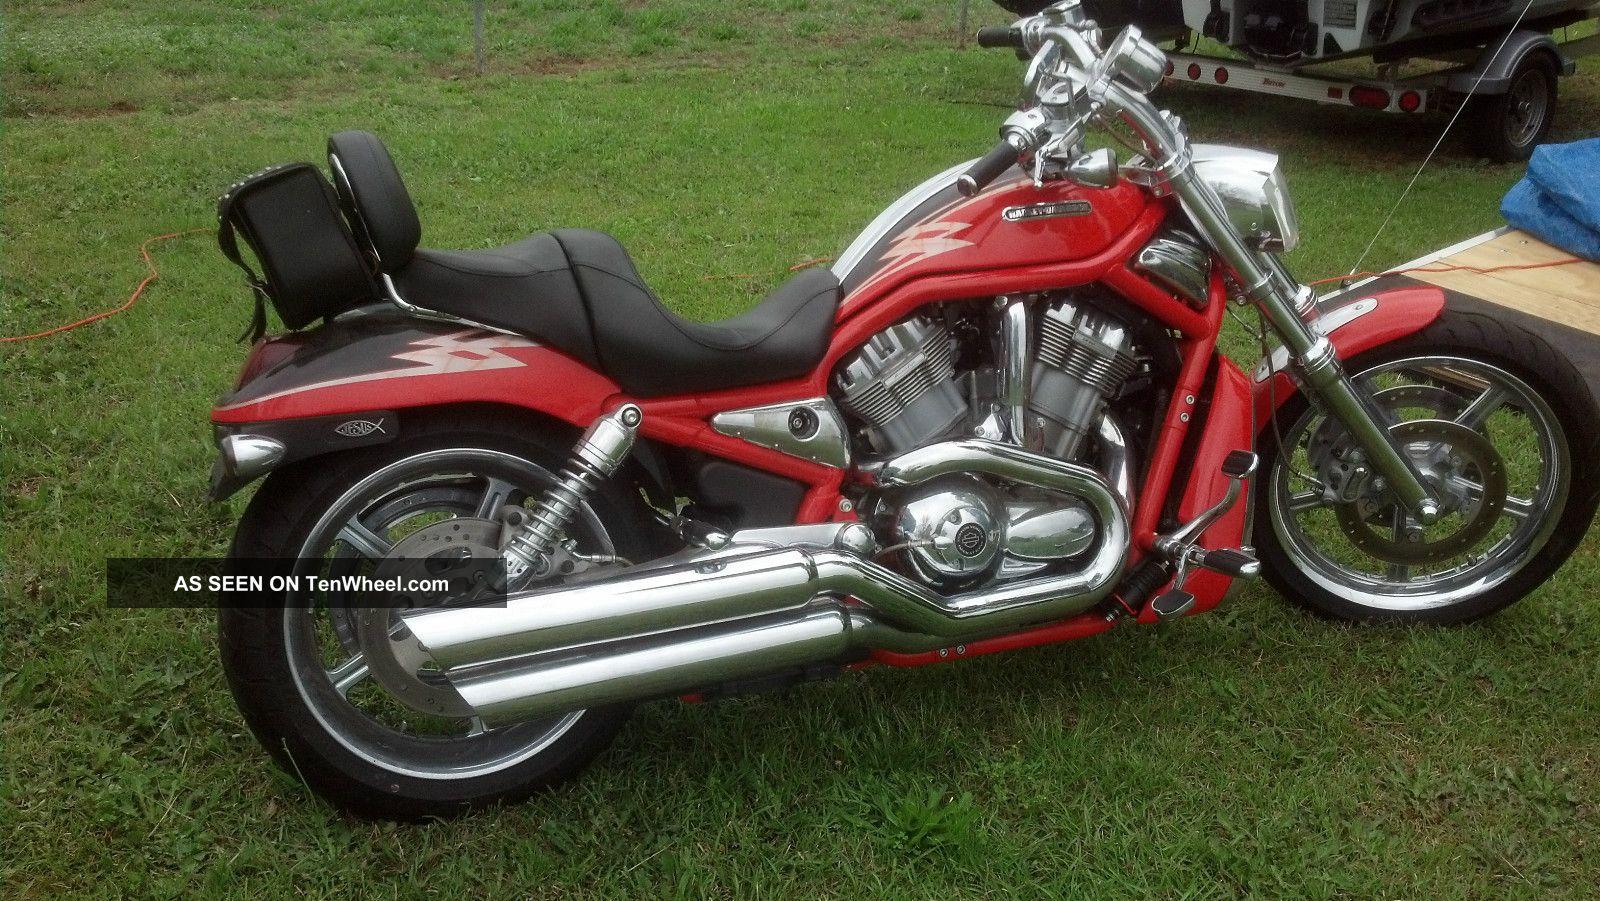 2005 Harley Davidson Cvo Screamin Eagle V - Rod Vrscse VRSC photo